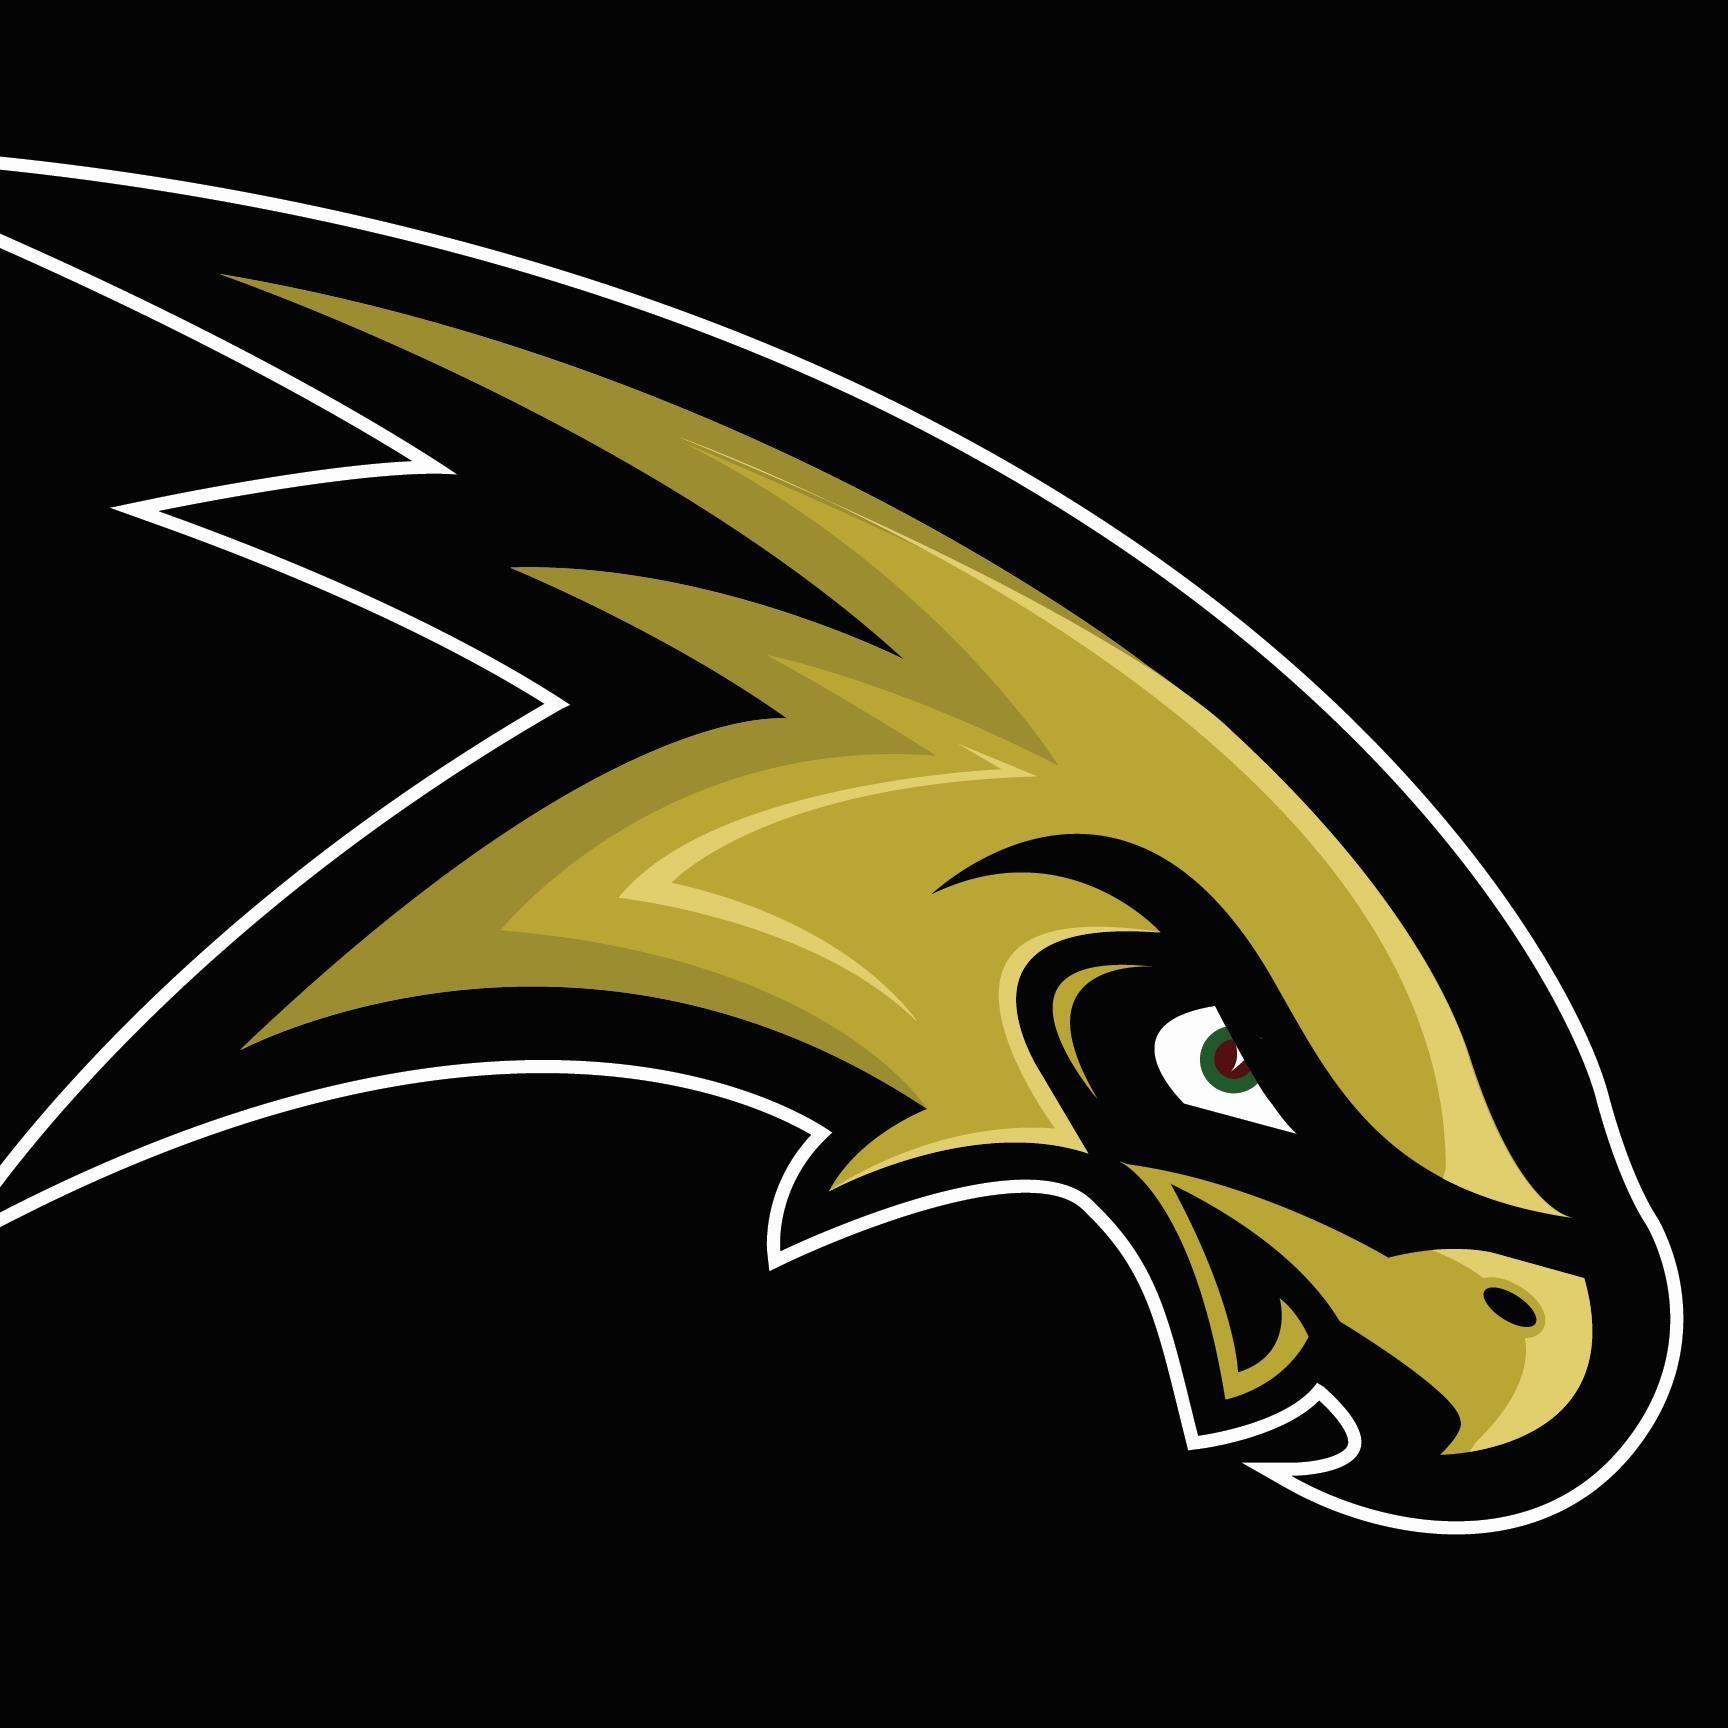 Hawthorn Hawks Logo 2016 Logo Vector Online